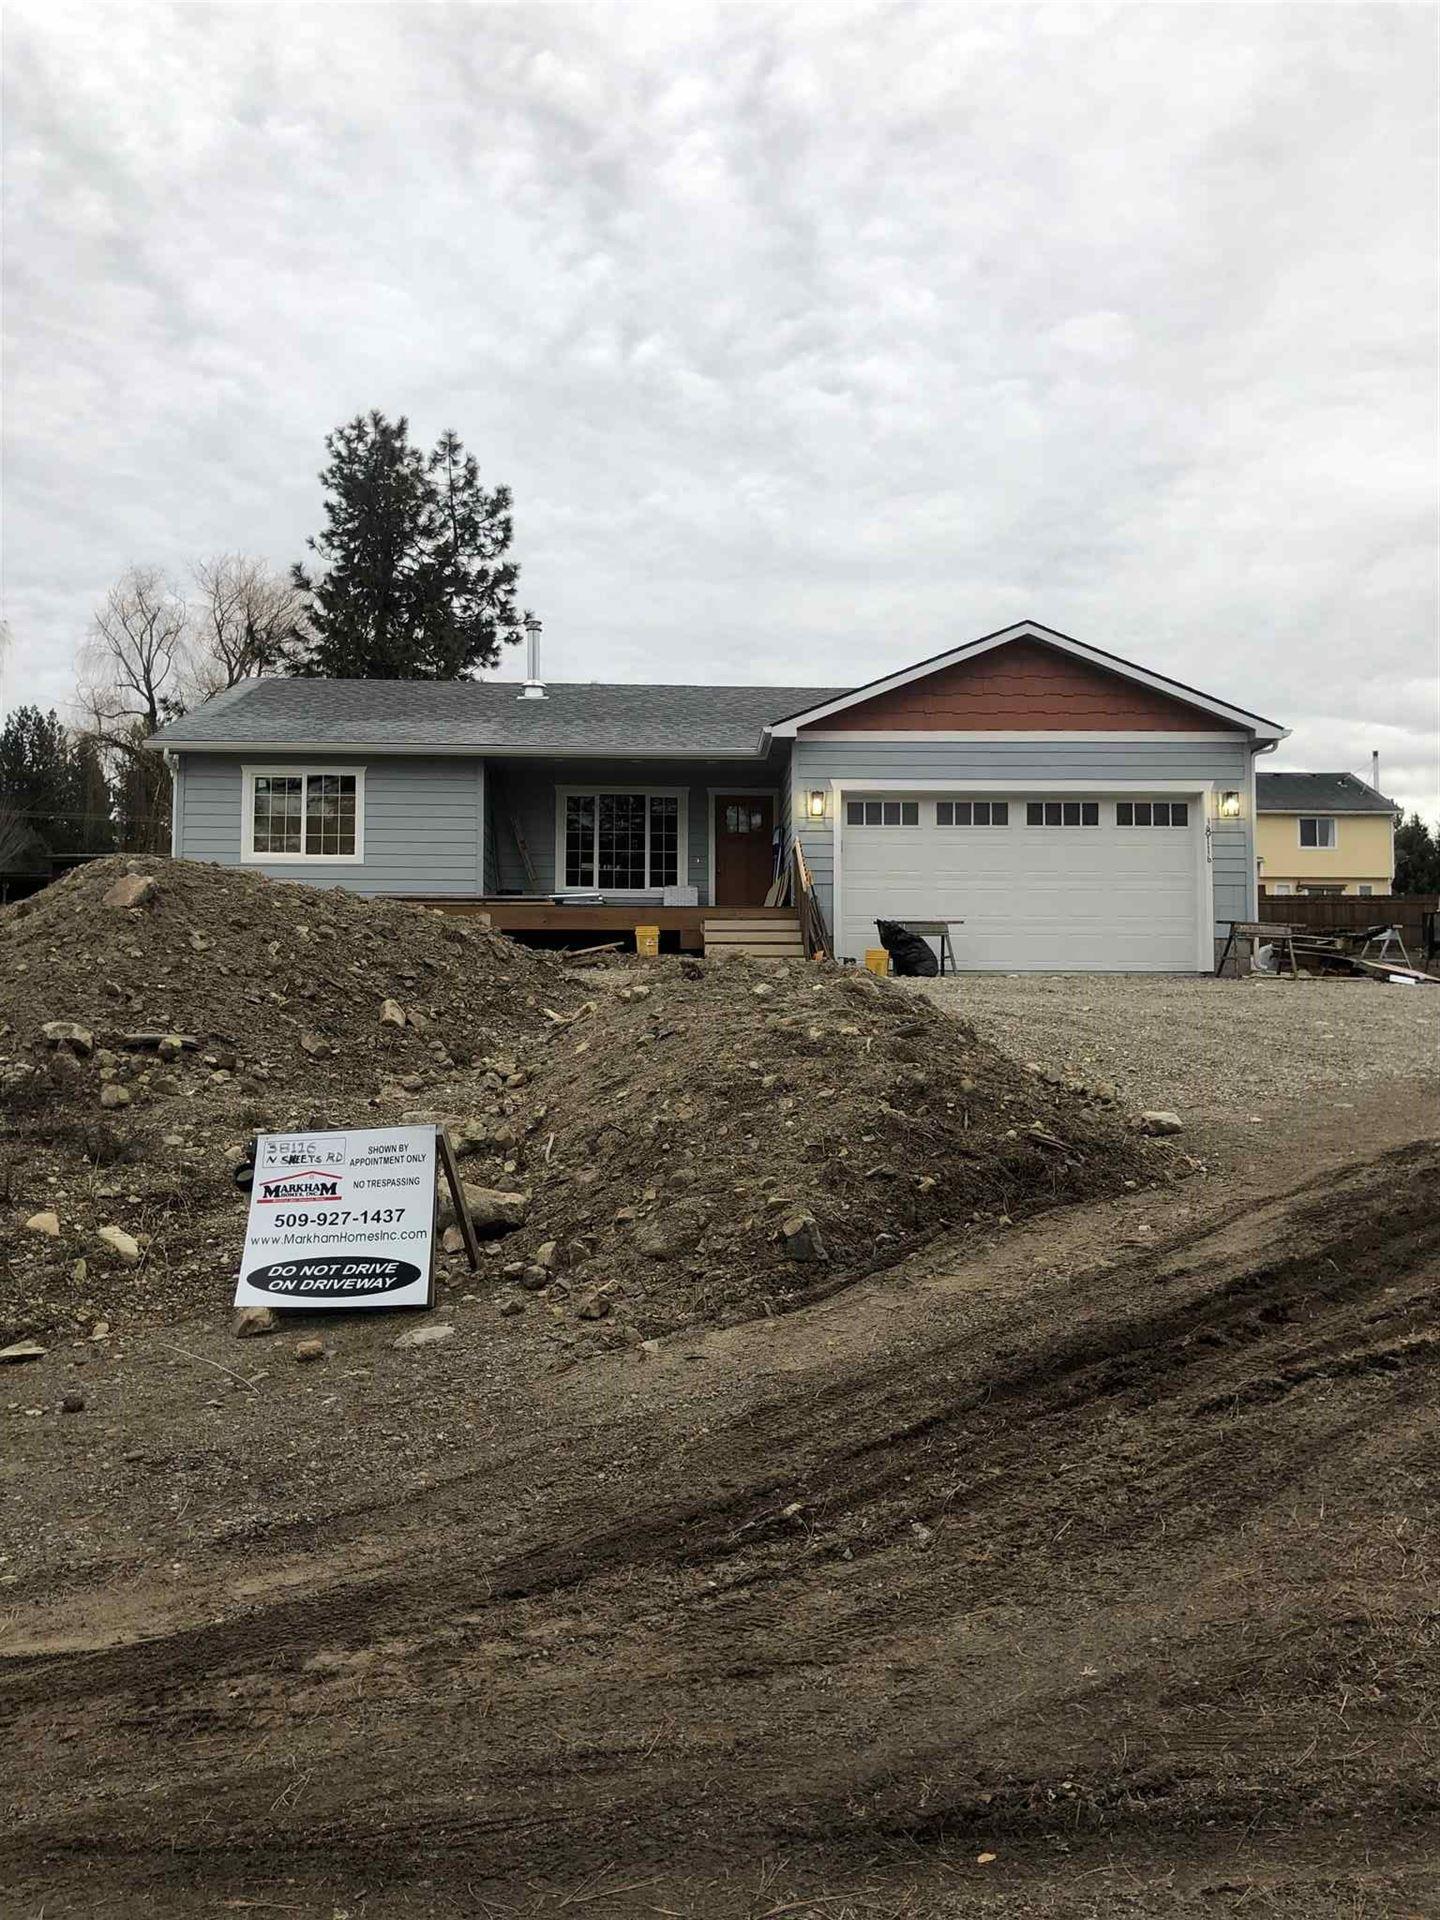 38116 N Sheets Rd, Elk, WA 99009 - #: 202110488